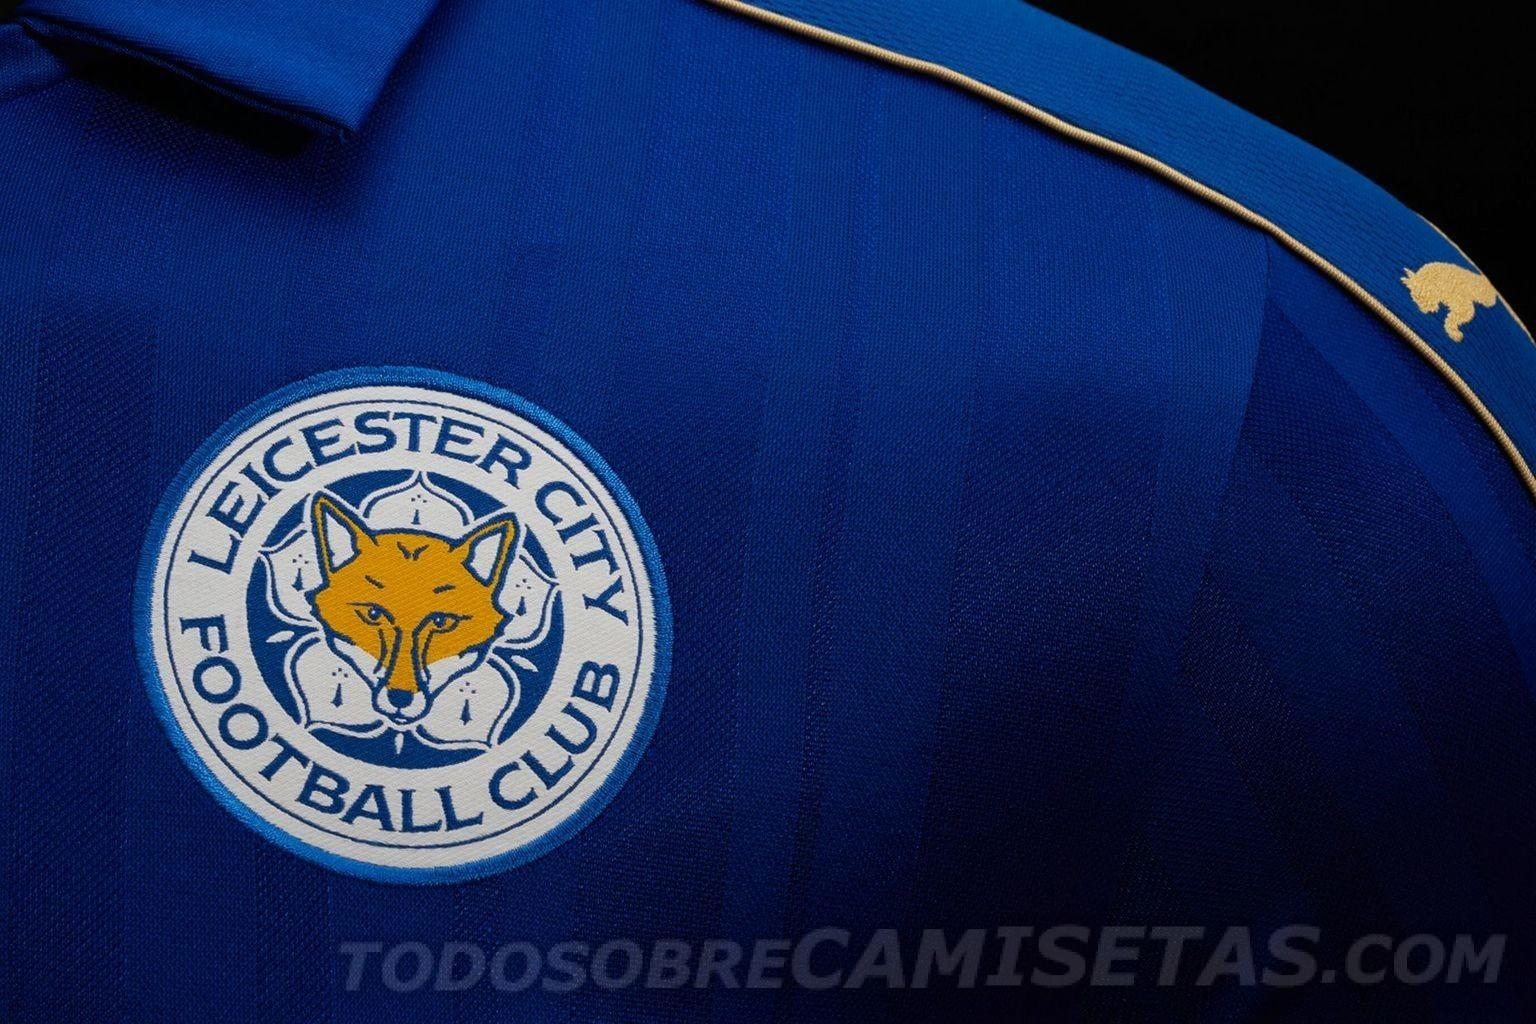 Leicester-City-16-17-PUMA-new-home-kit-3.jpg